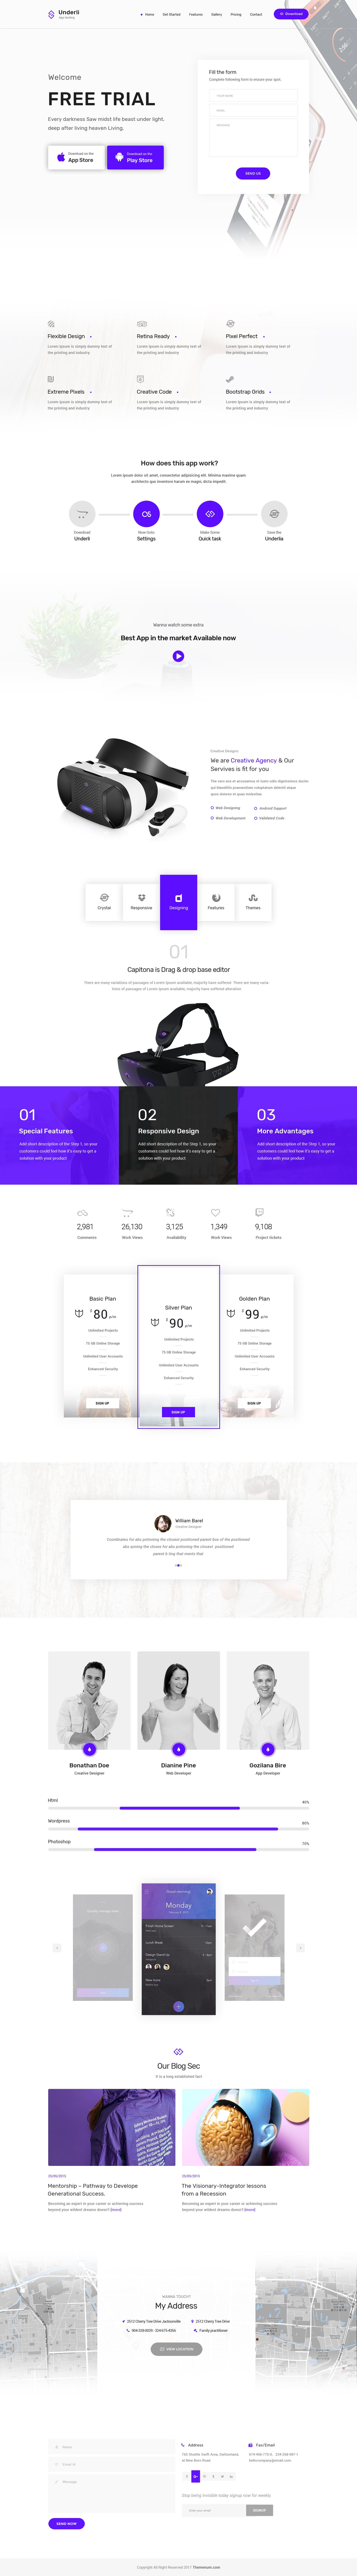 app landing page product showcase psd template themenum by themenum. Black Bedroom Furniture Sets. Home Design Ideas